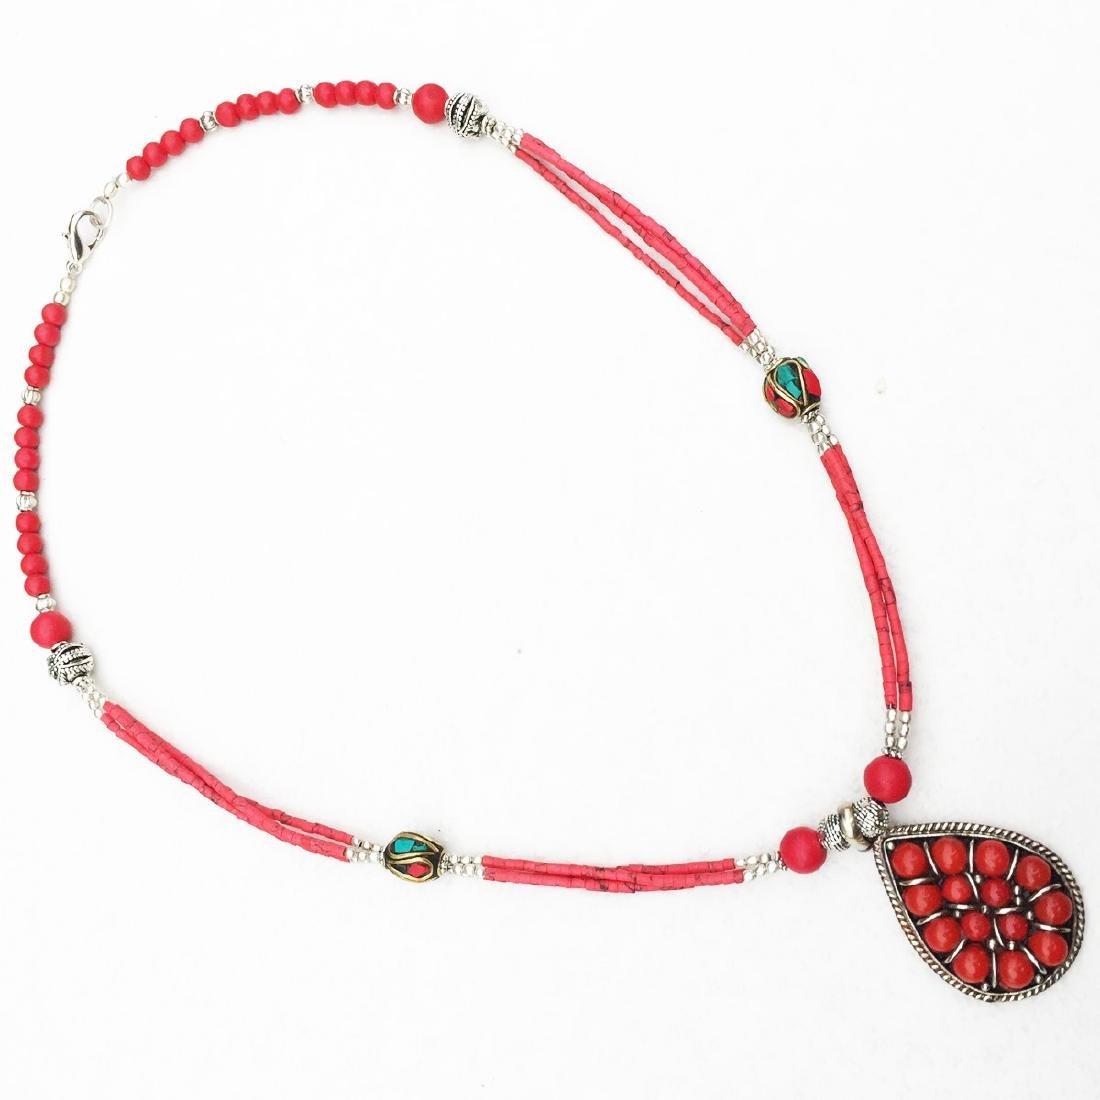 Nepali Handmade Tibetan Turquoise & Coral Necklace - 2